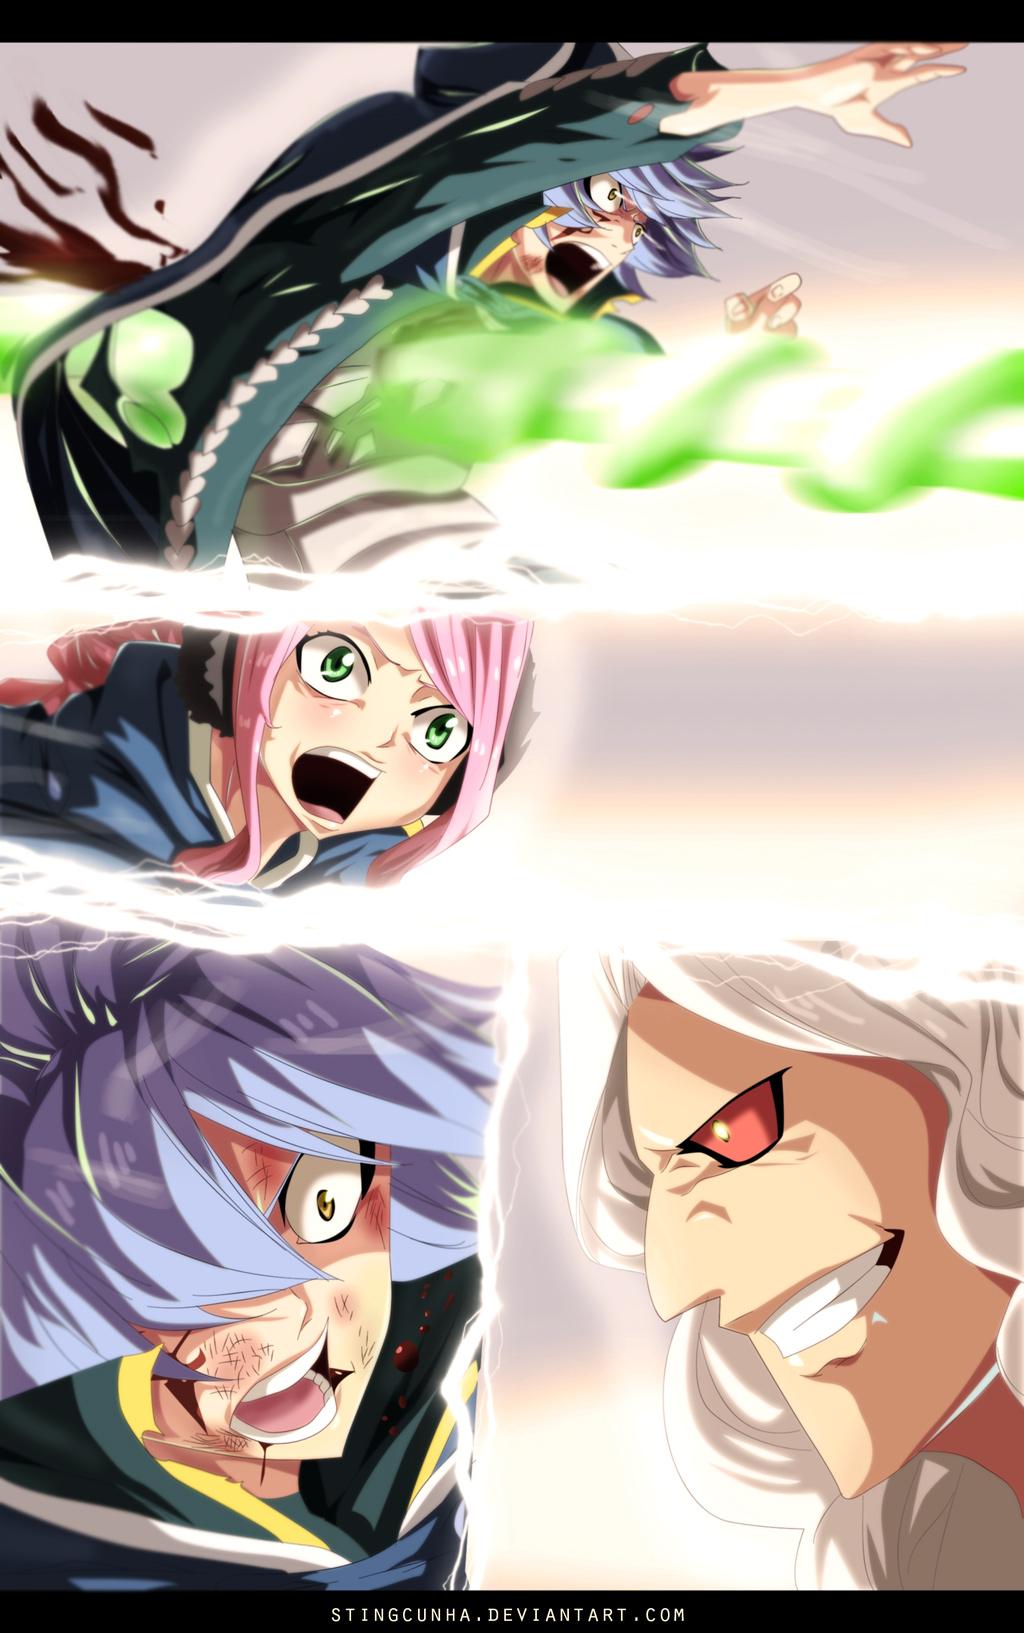 "Fairy Tail chapter 368 - Jellal's ""death"" - colour by StingCunha (http://stingcunha.deviantart.com)"